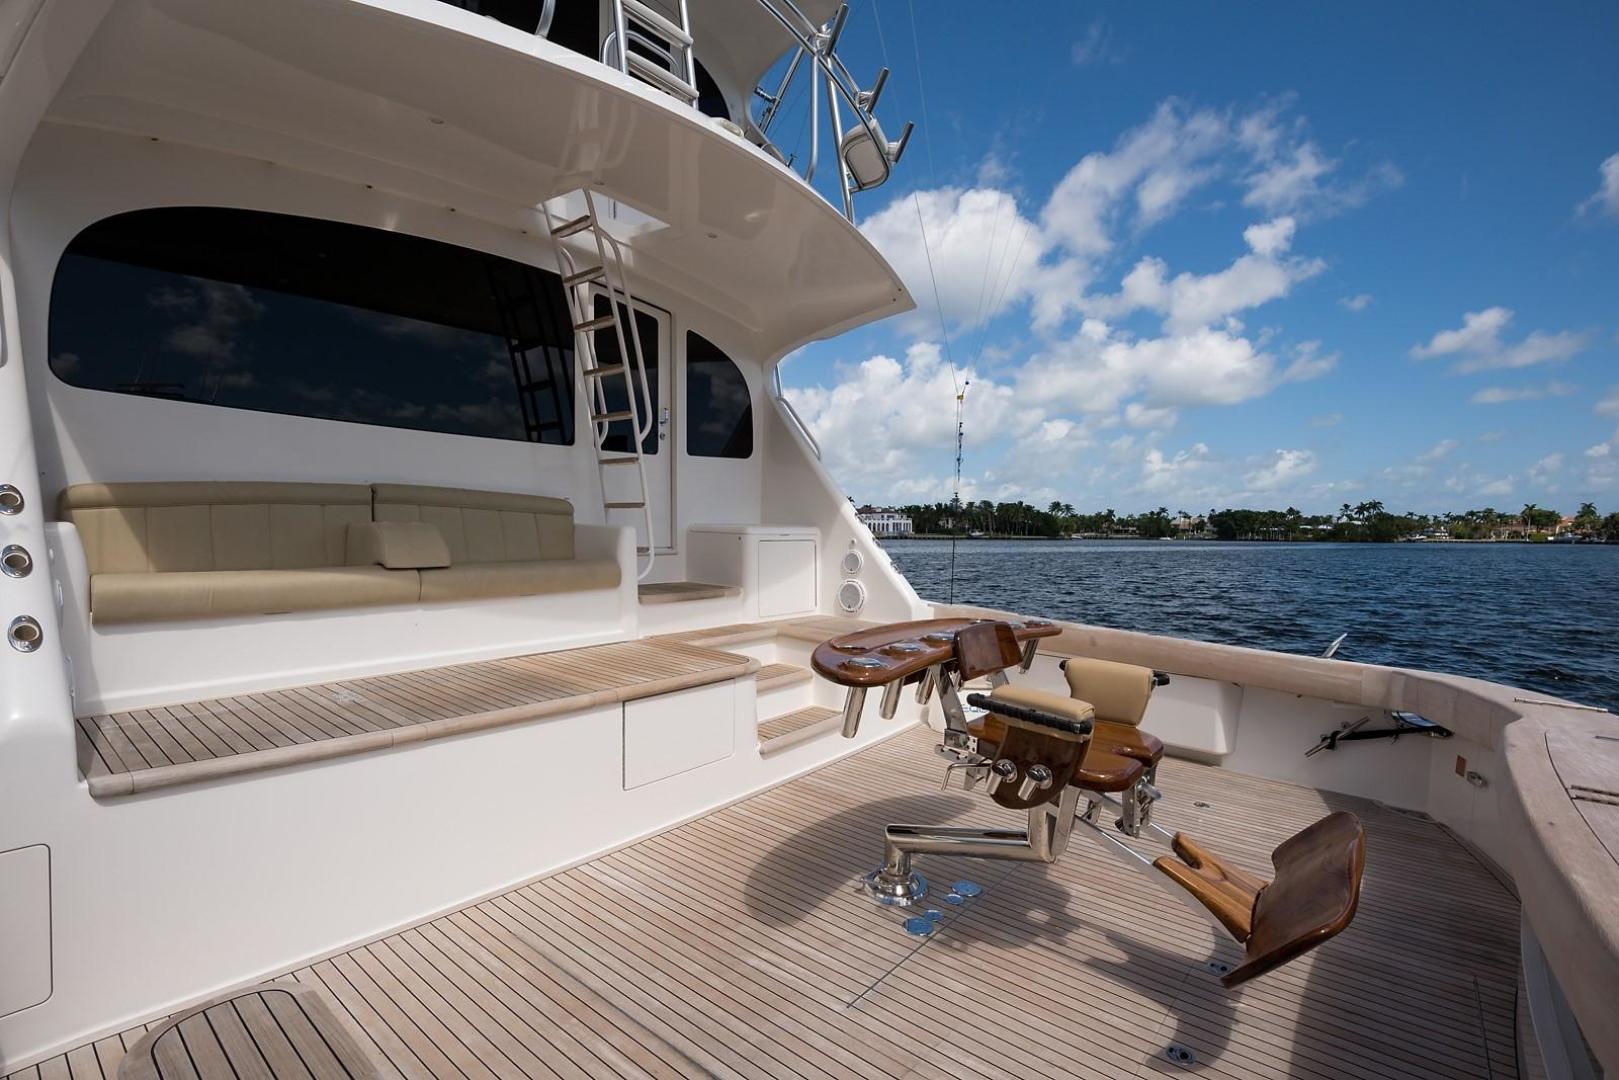 Viking-Enclosed 2013-No Name 82 Miami-Florida-United States-Cockpit-1324725 | Thumbnail